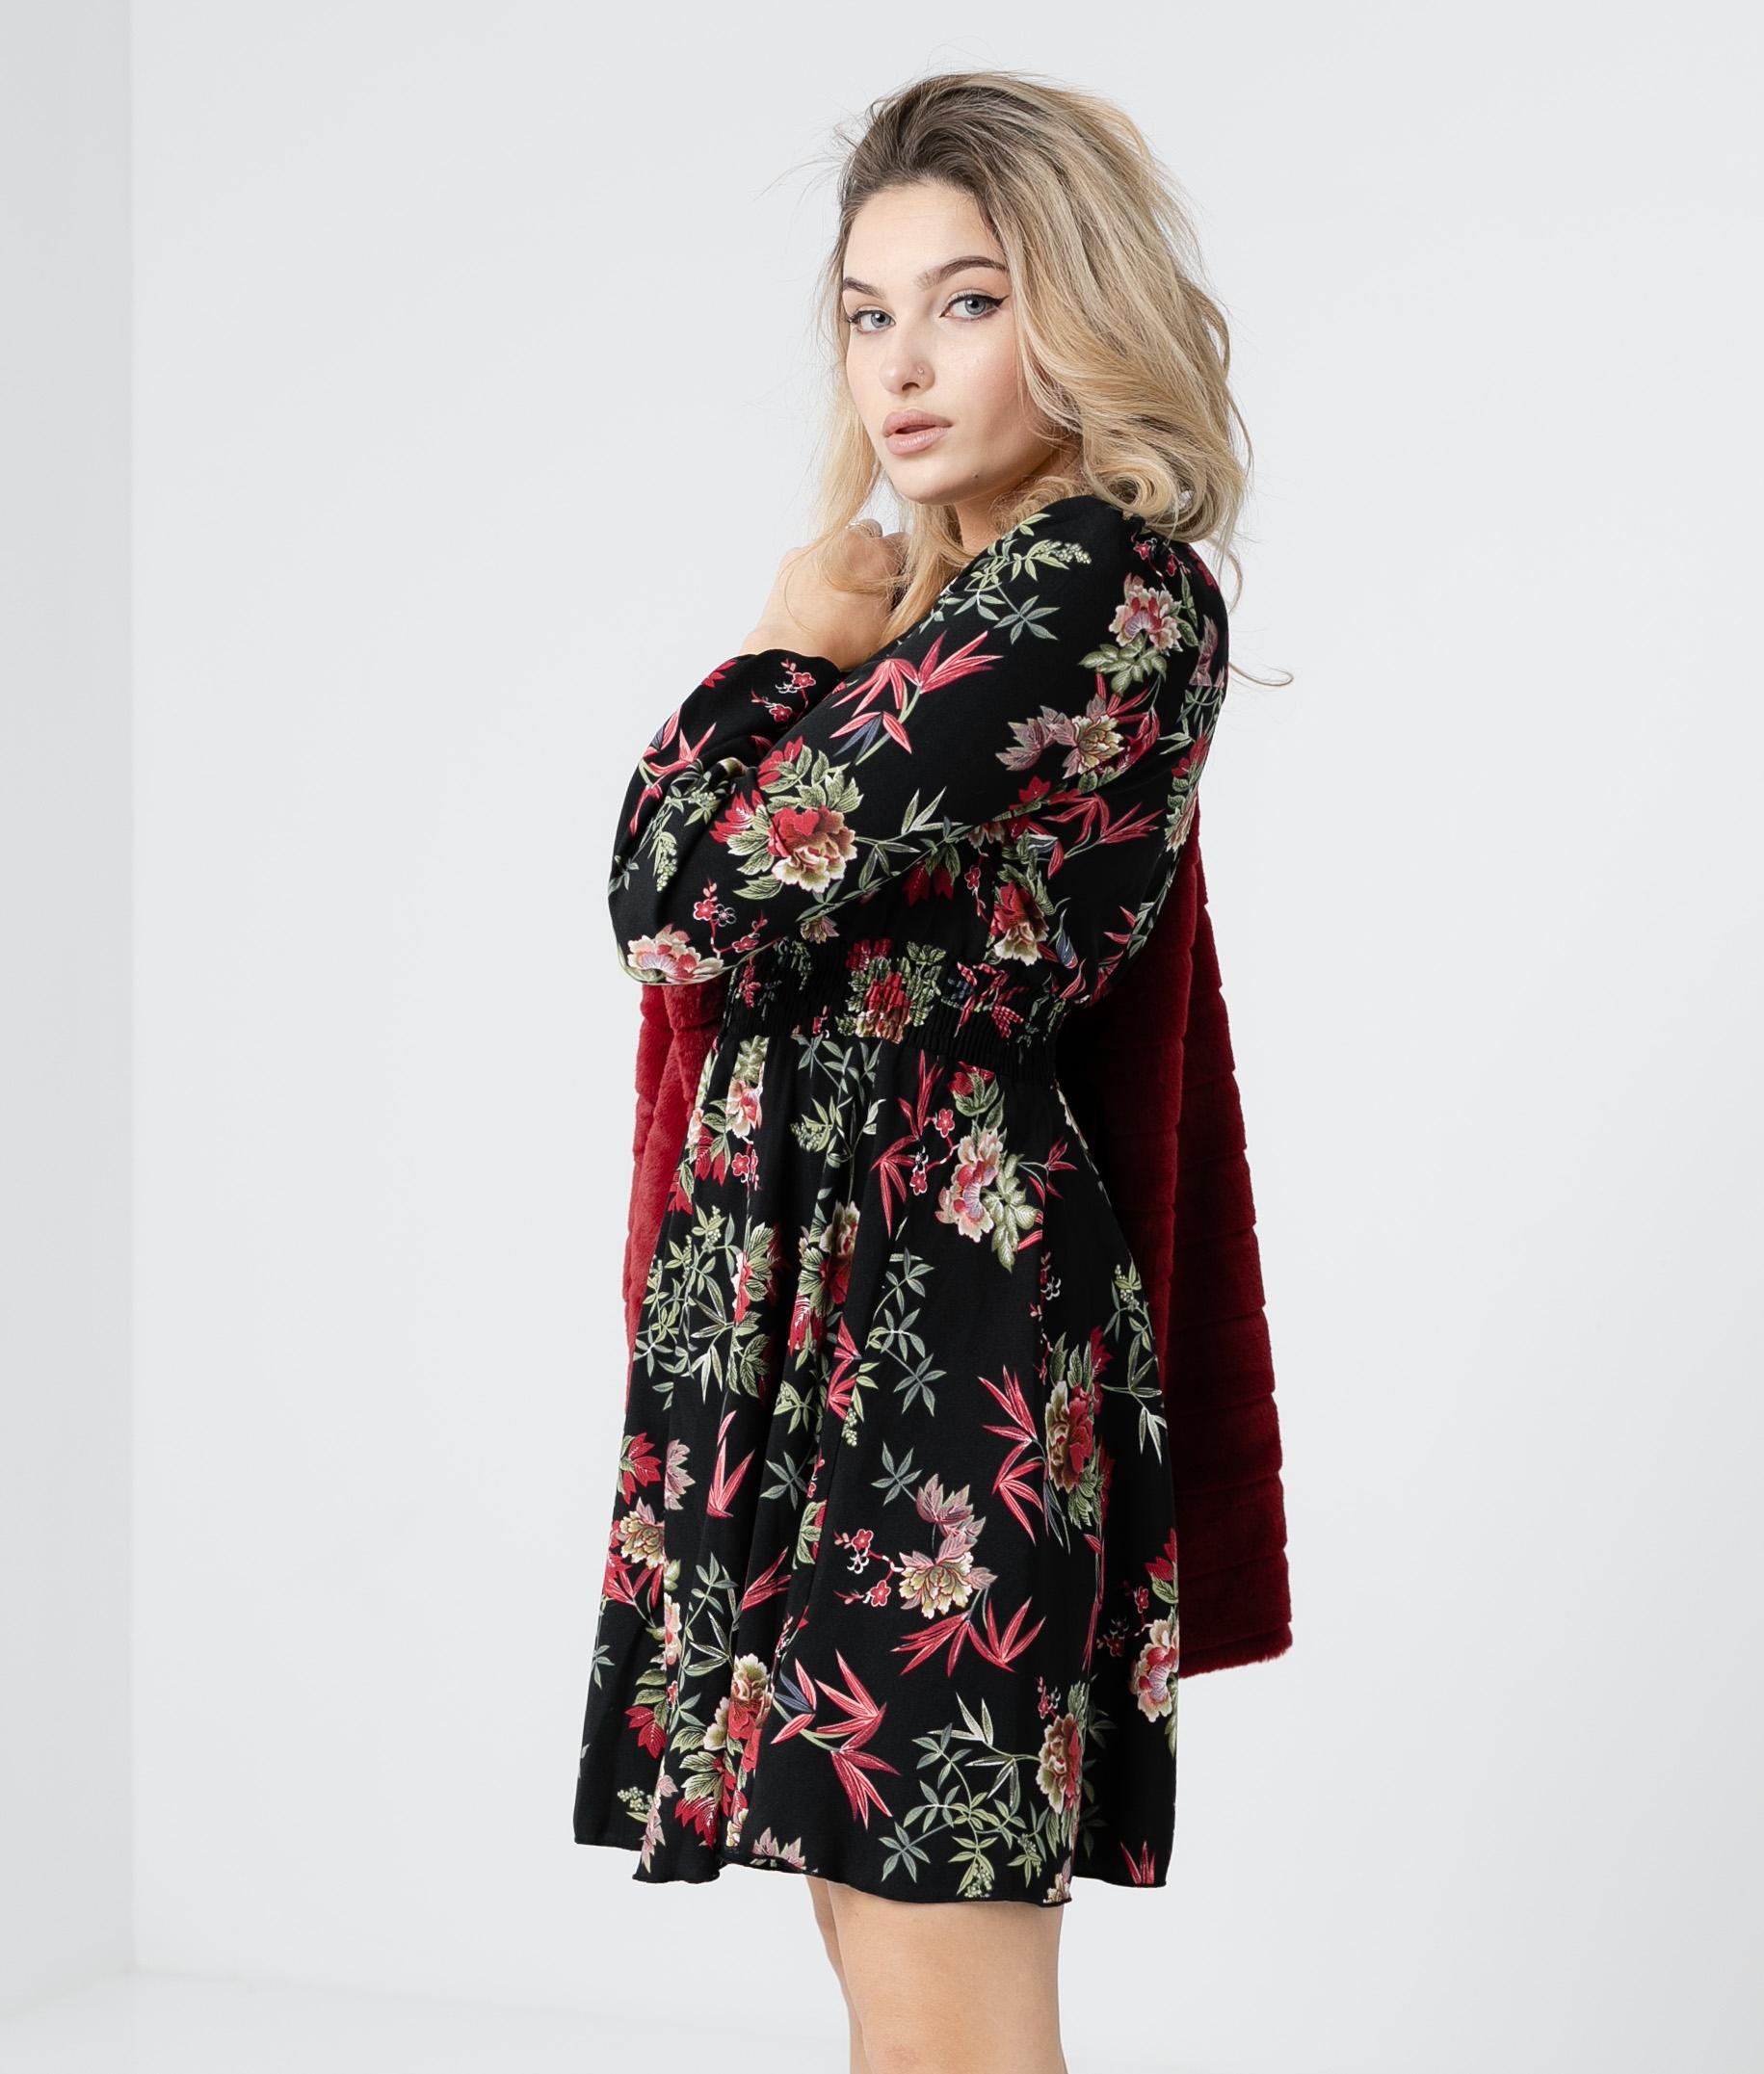 DRESS LOSUR - BLACK